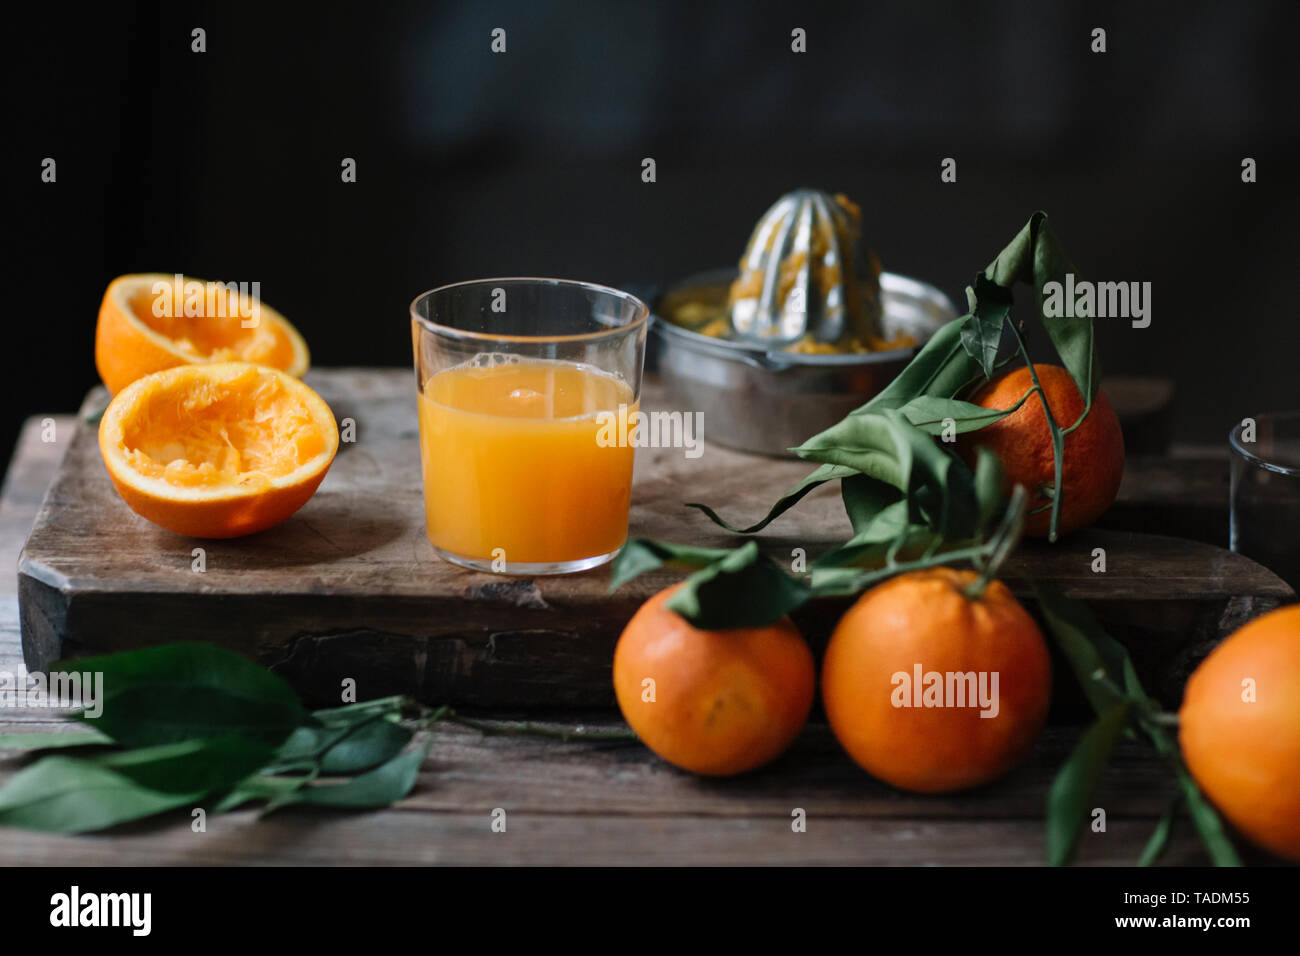 Glass of freshly squeezed orange juice - Stock Image